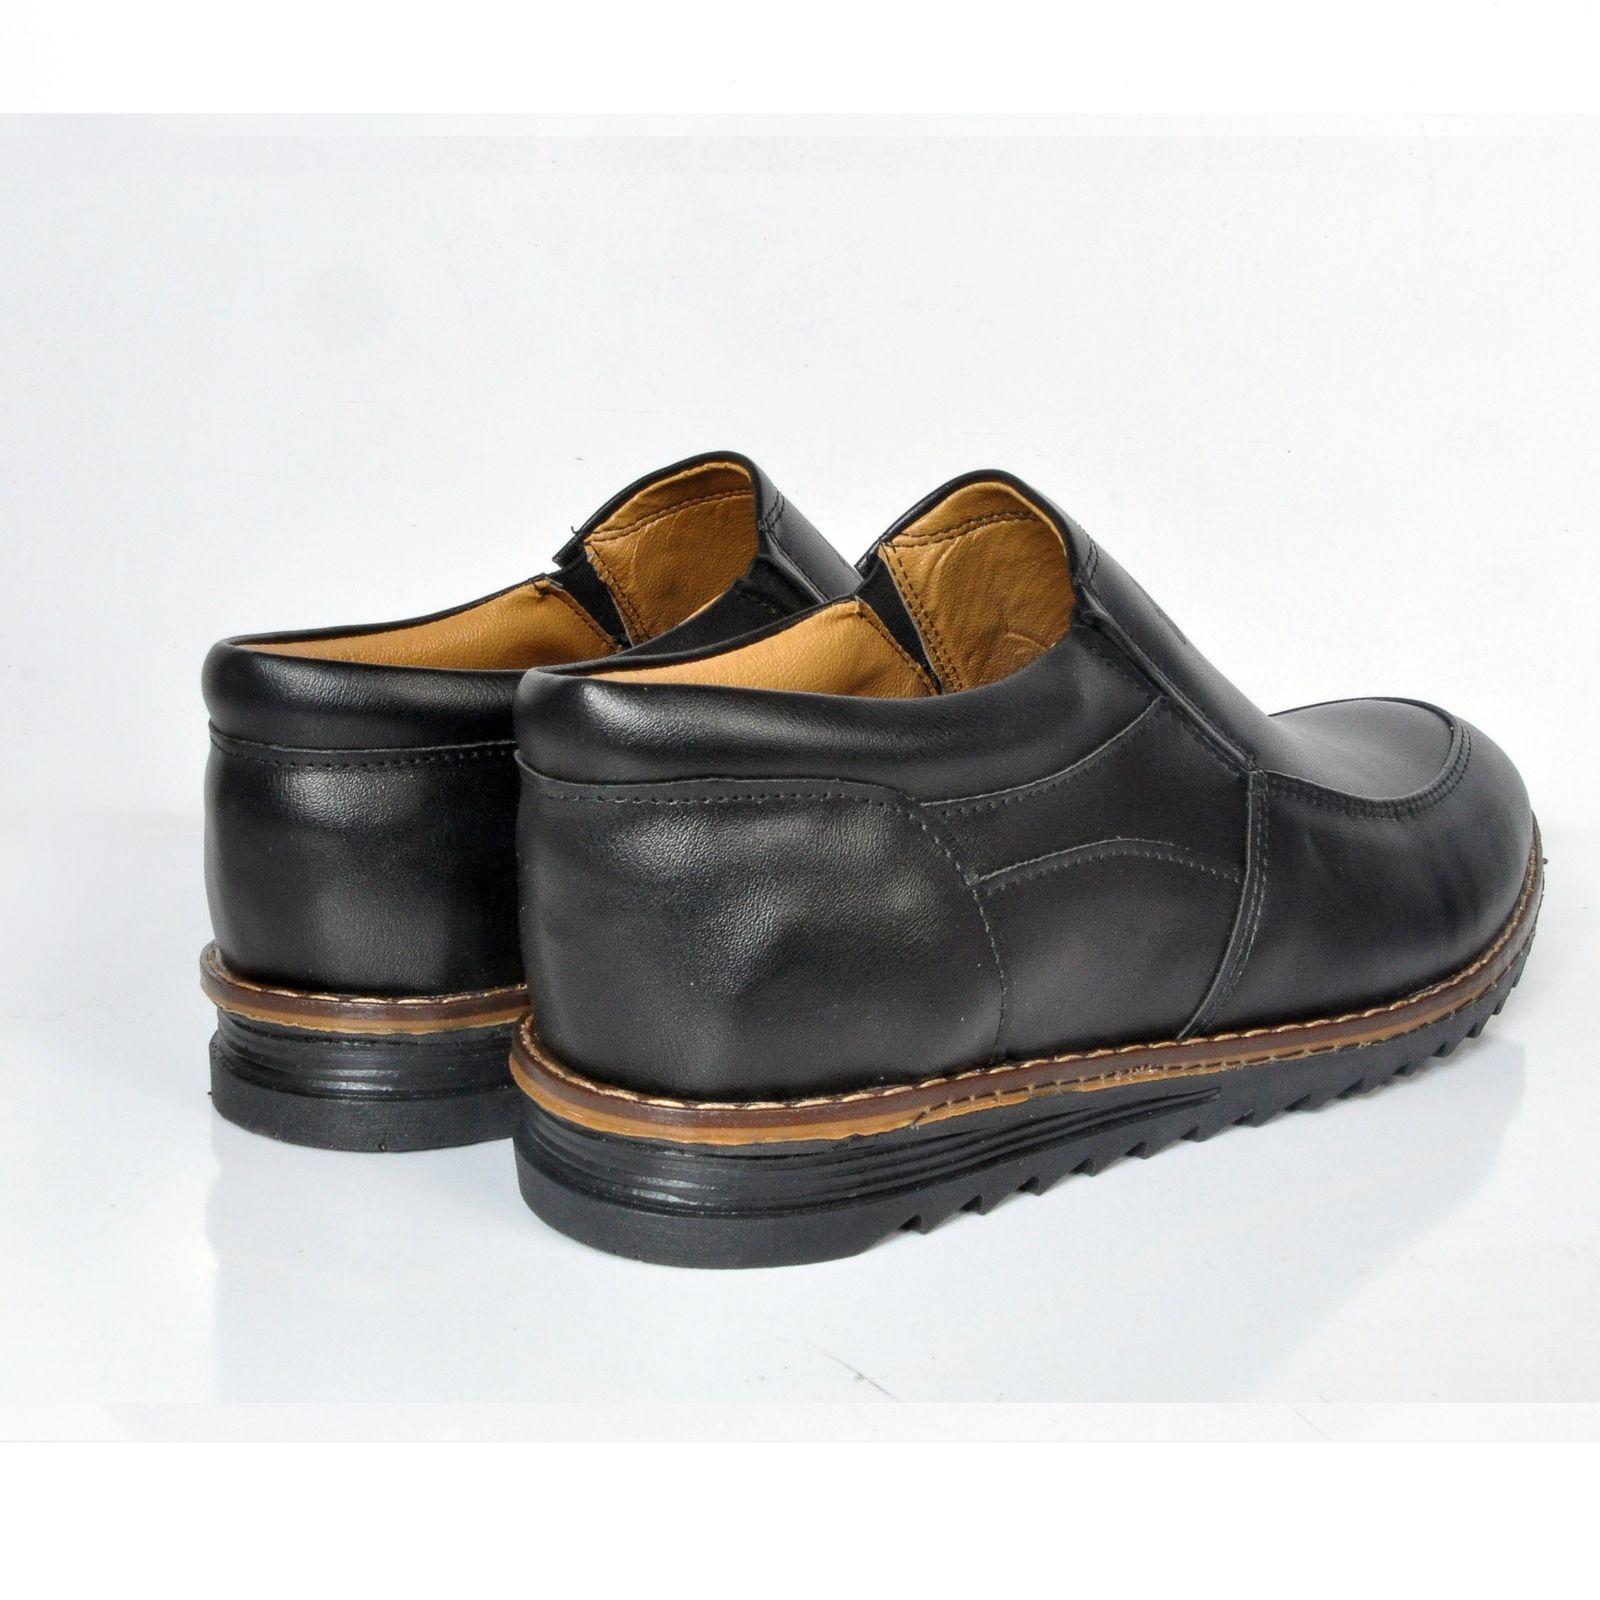 کفش روزمره مردانه مدل m289m -  - 2